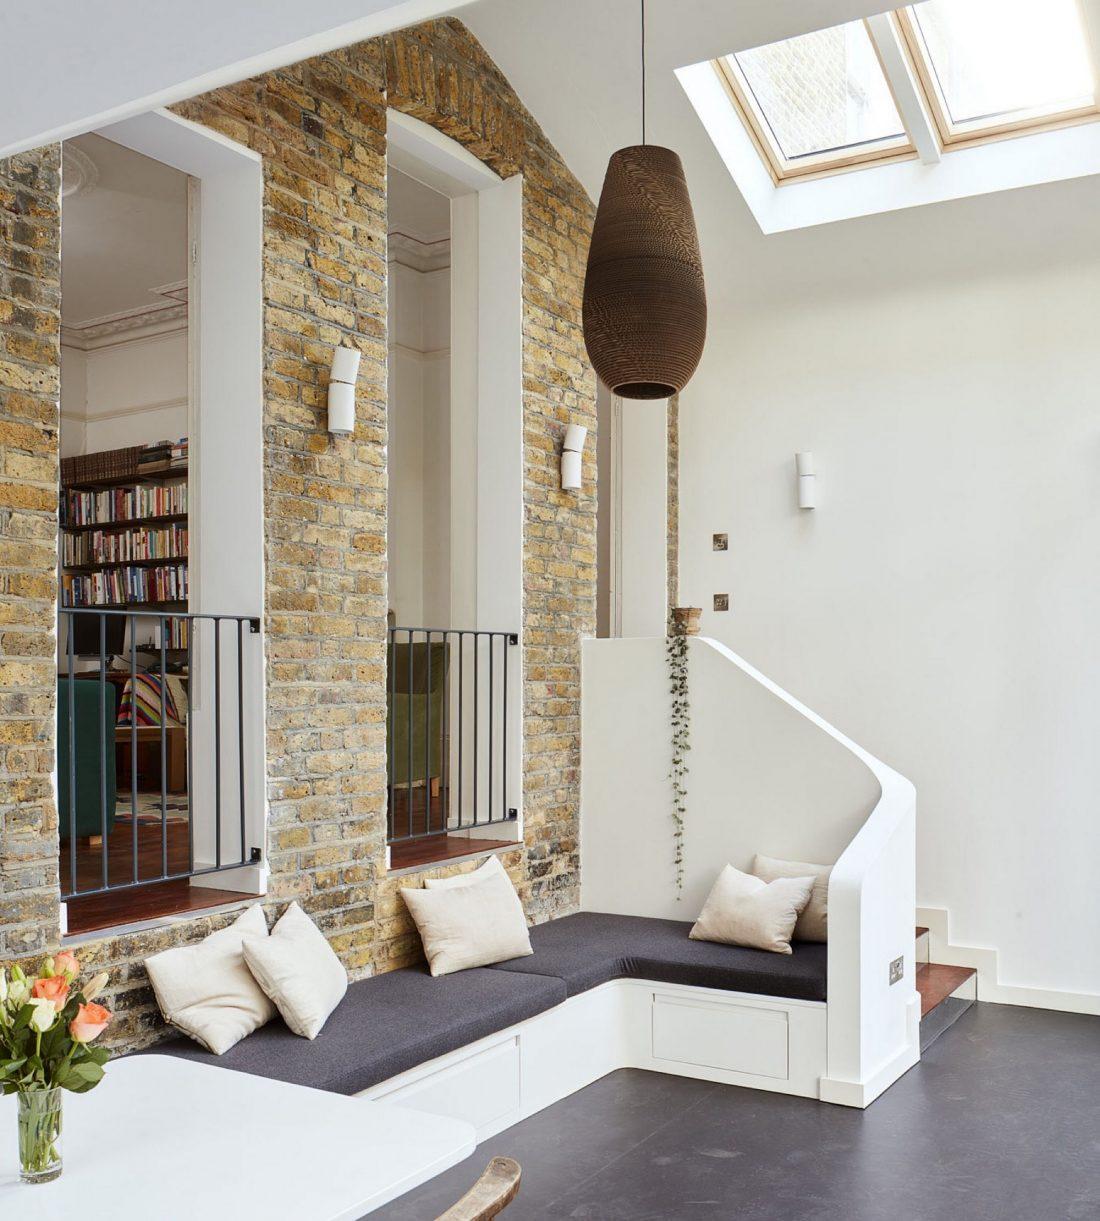 preobrazovanie-viktorianskoj-villy-v-londone-ot-scenario-architecture-7